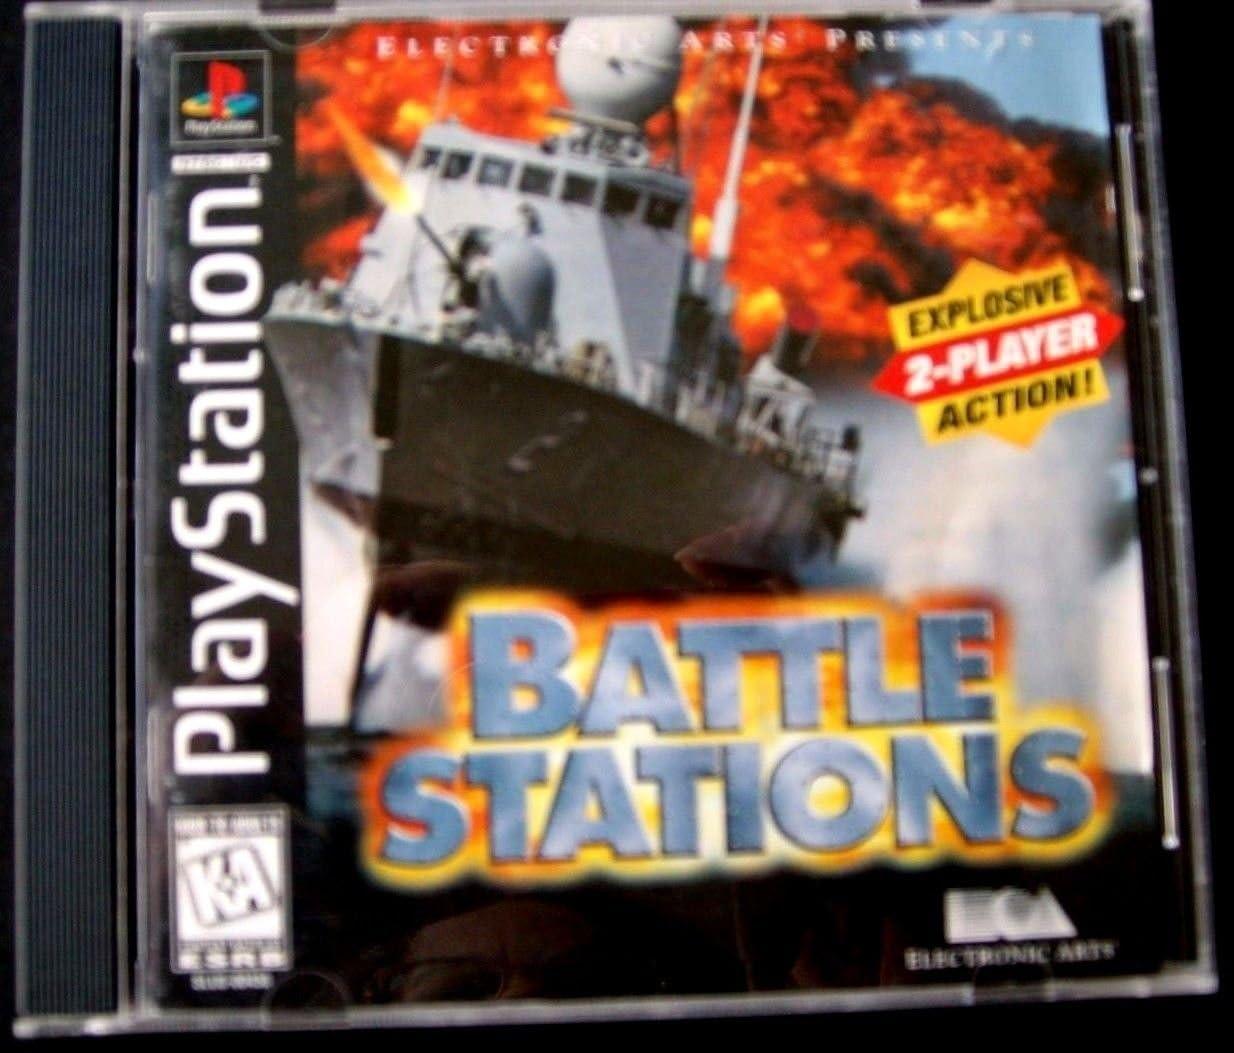 Amazon com: Battlestations - PlayStation: Unknown: Video Games